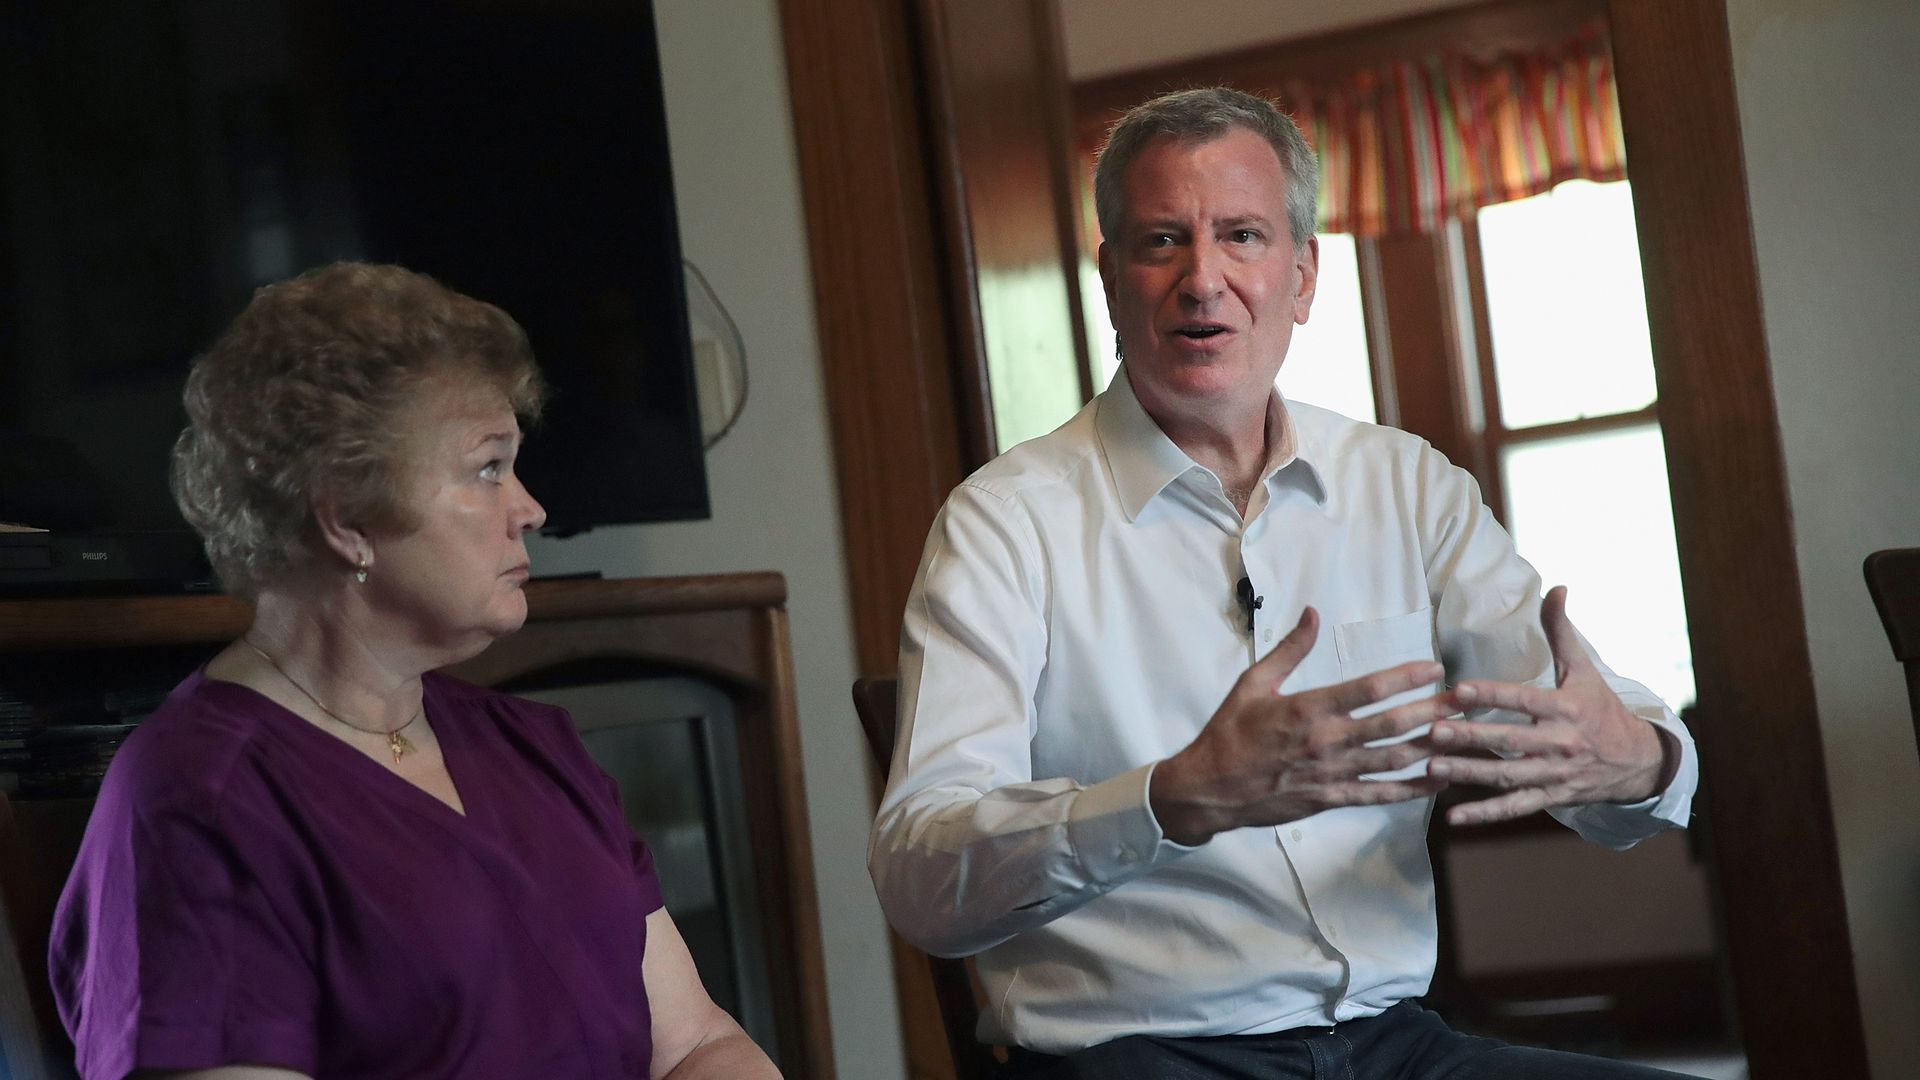 New York City Mayor Bill de Blasio campaigning in Iowa